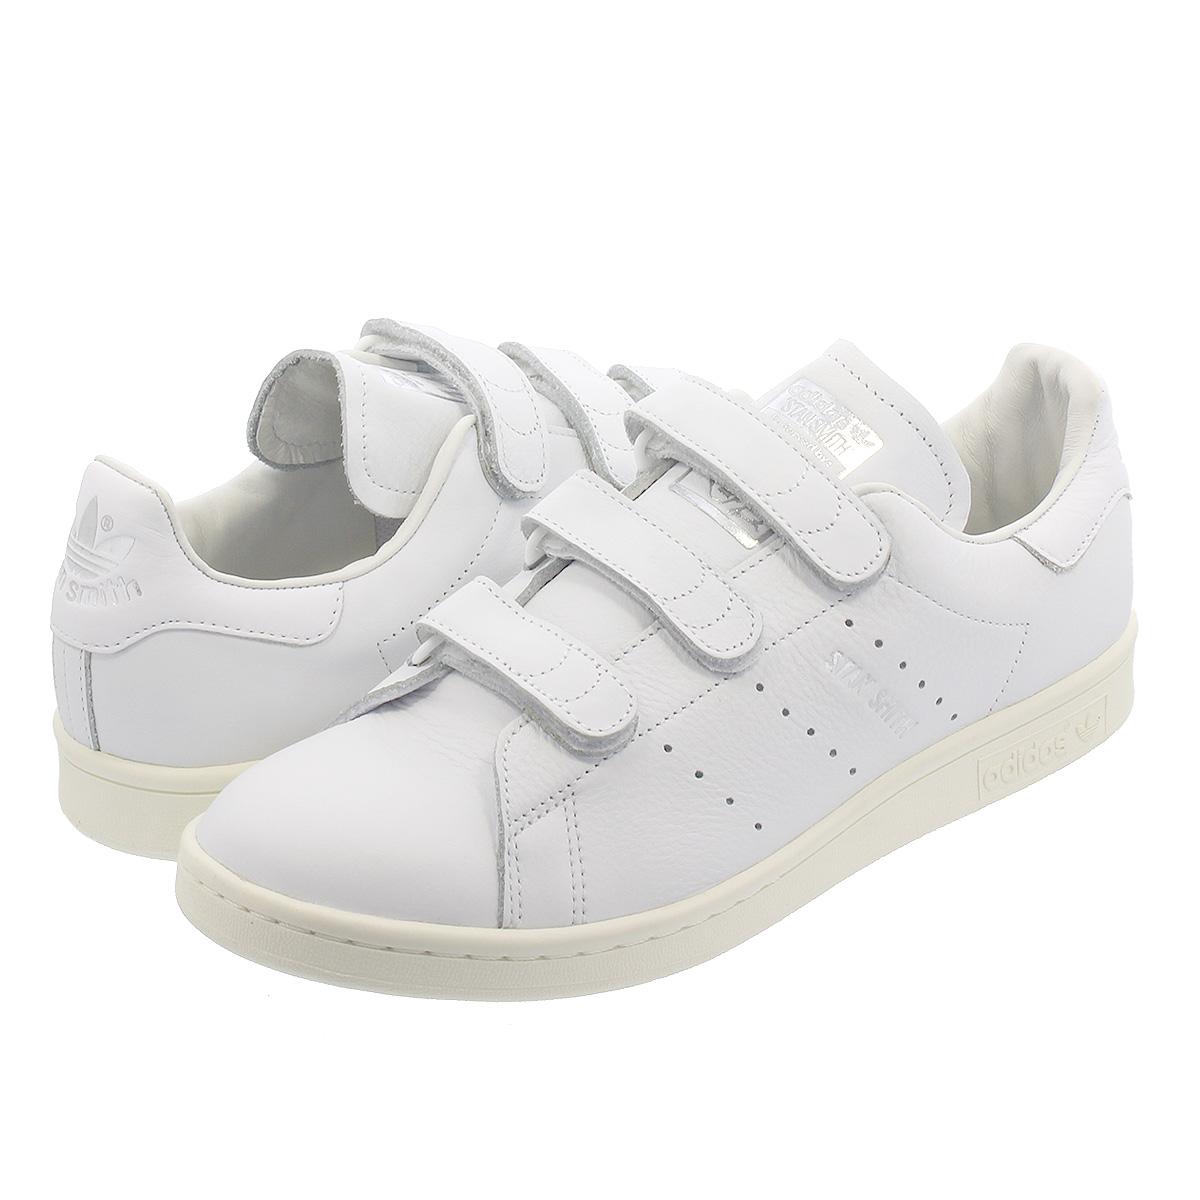 adidas STAN SMITH CF 【adidas Originals】 アディダス スタンスミス CF RUNNING WHITE/RUNNING WHITE/SILVER ee8543